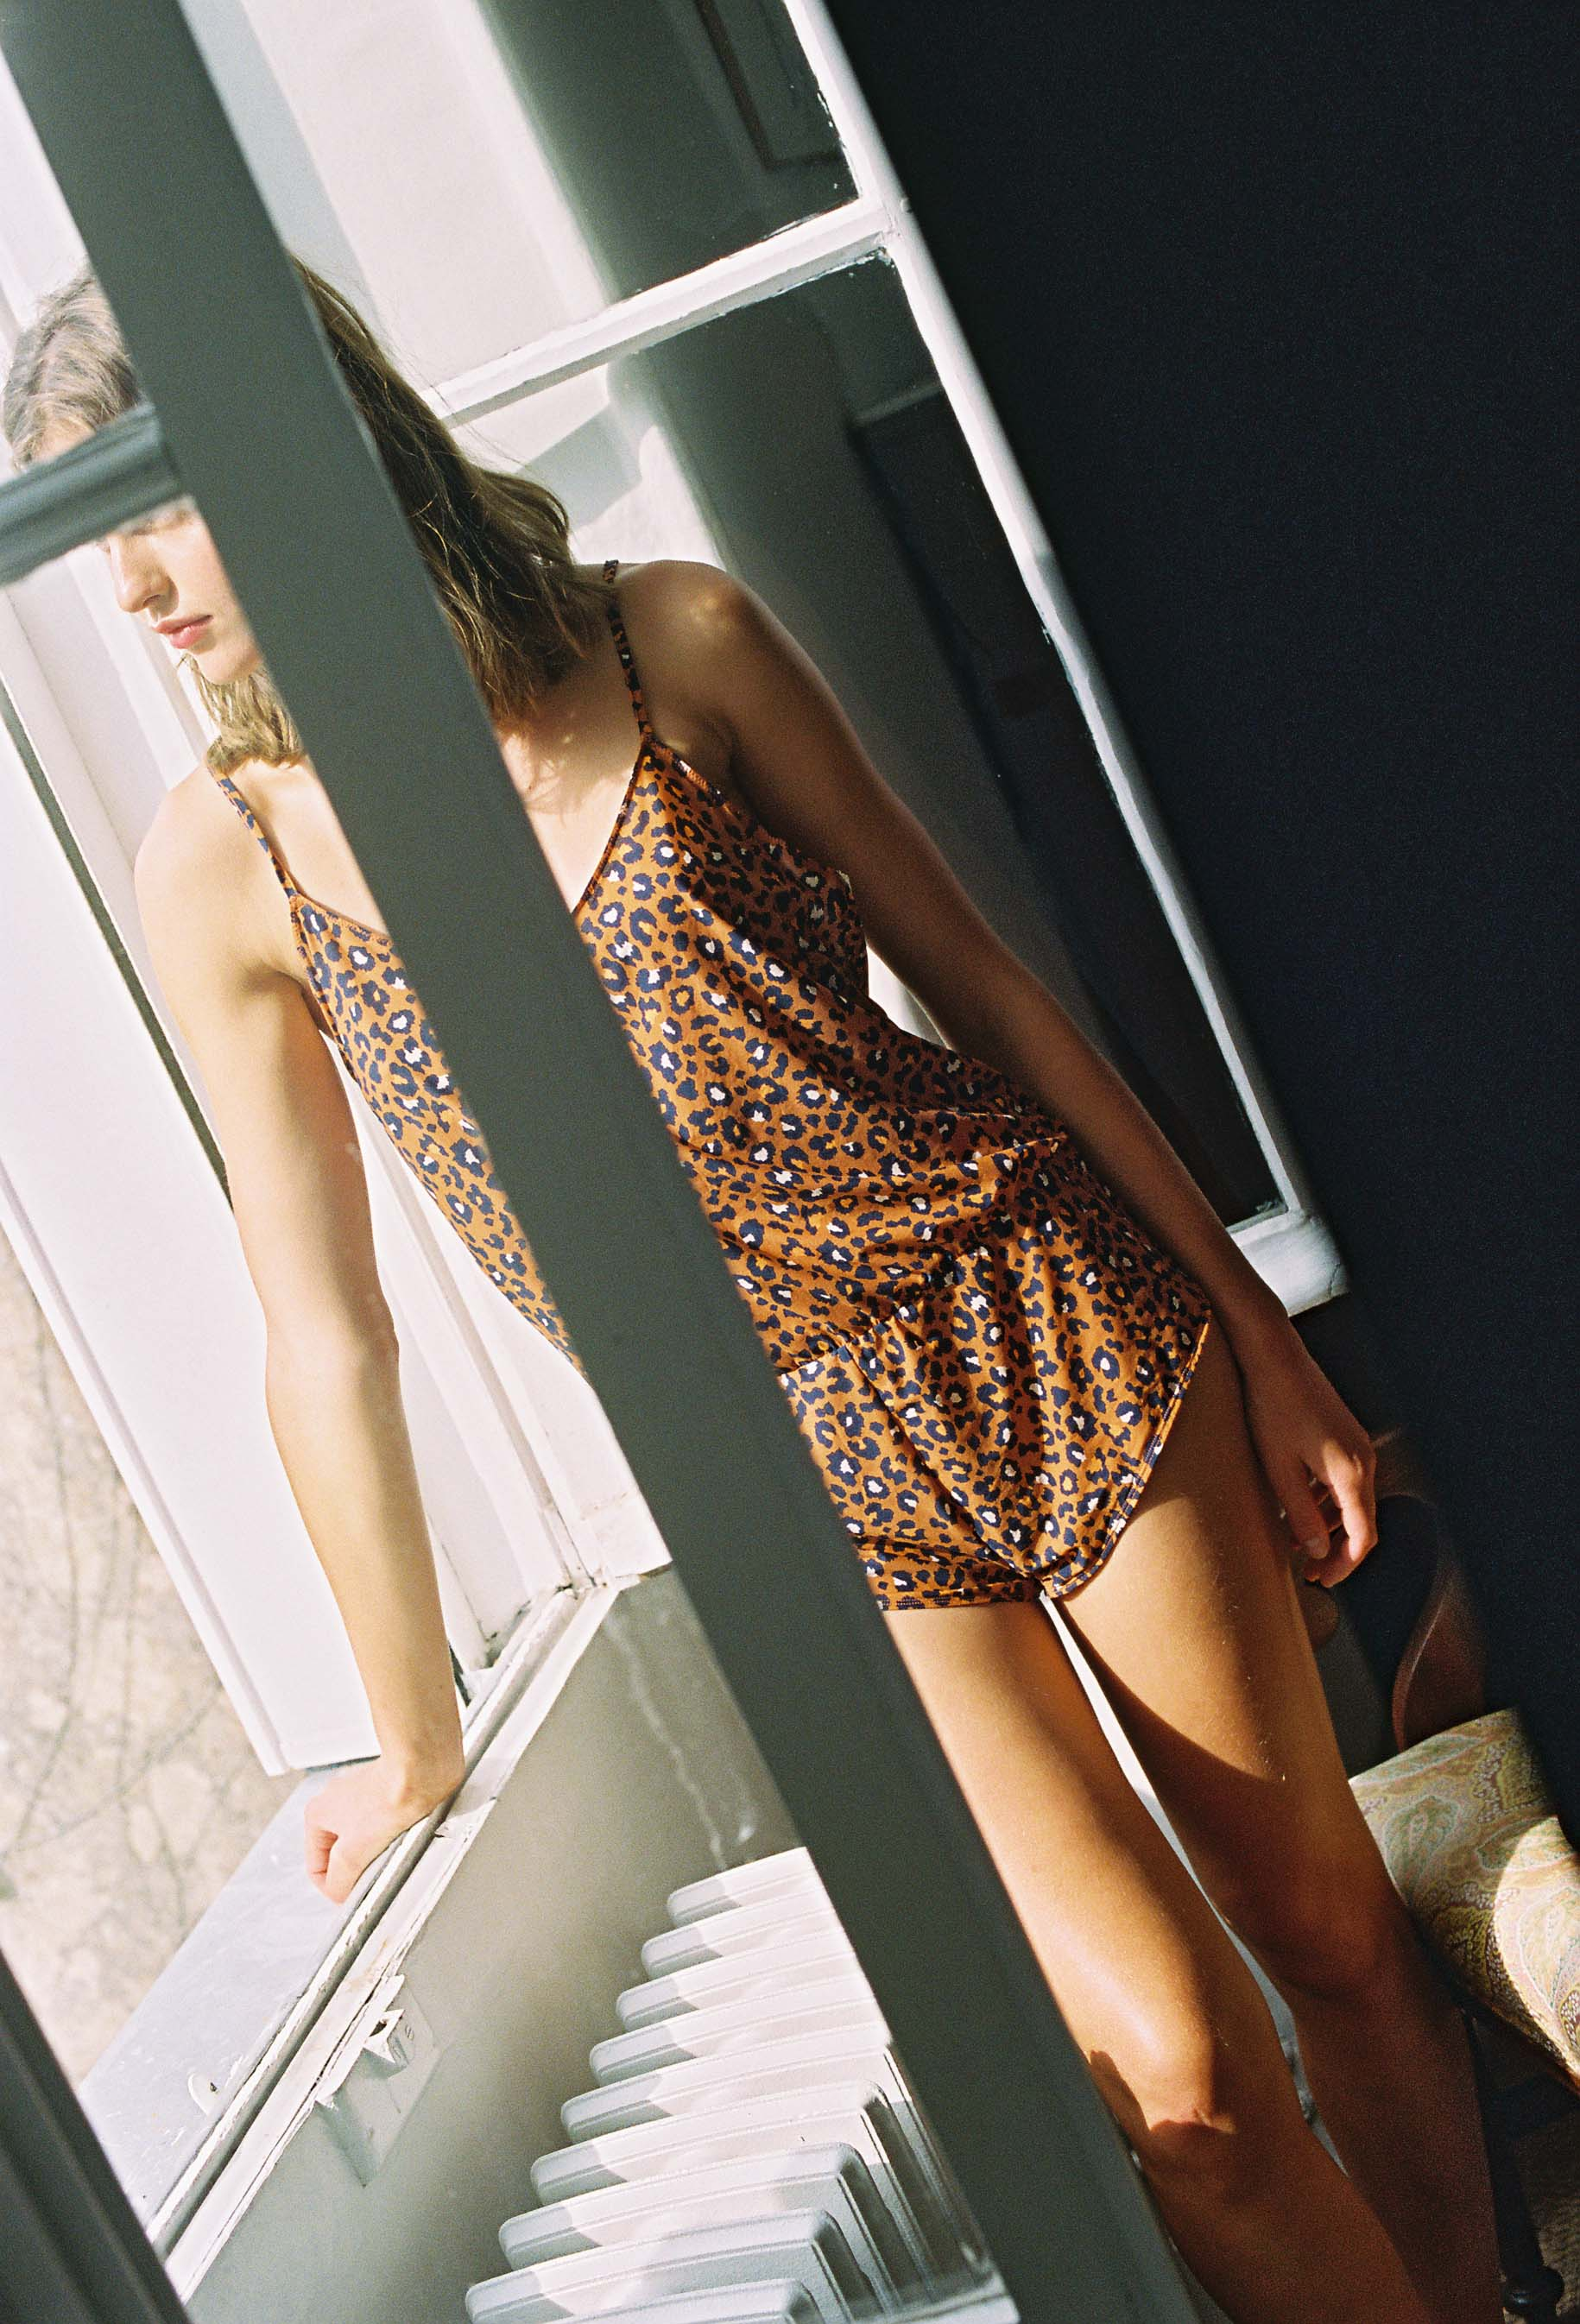 lingerie teddy Spice Mush 49 € Girls In Paris photo 1